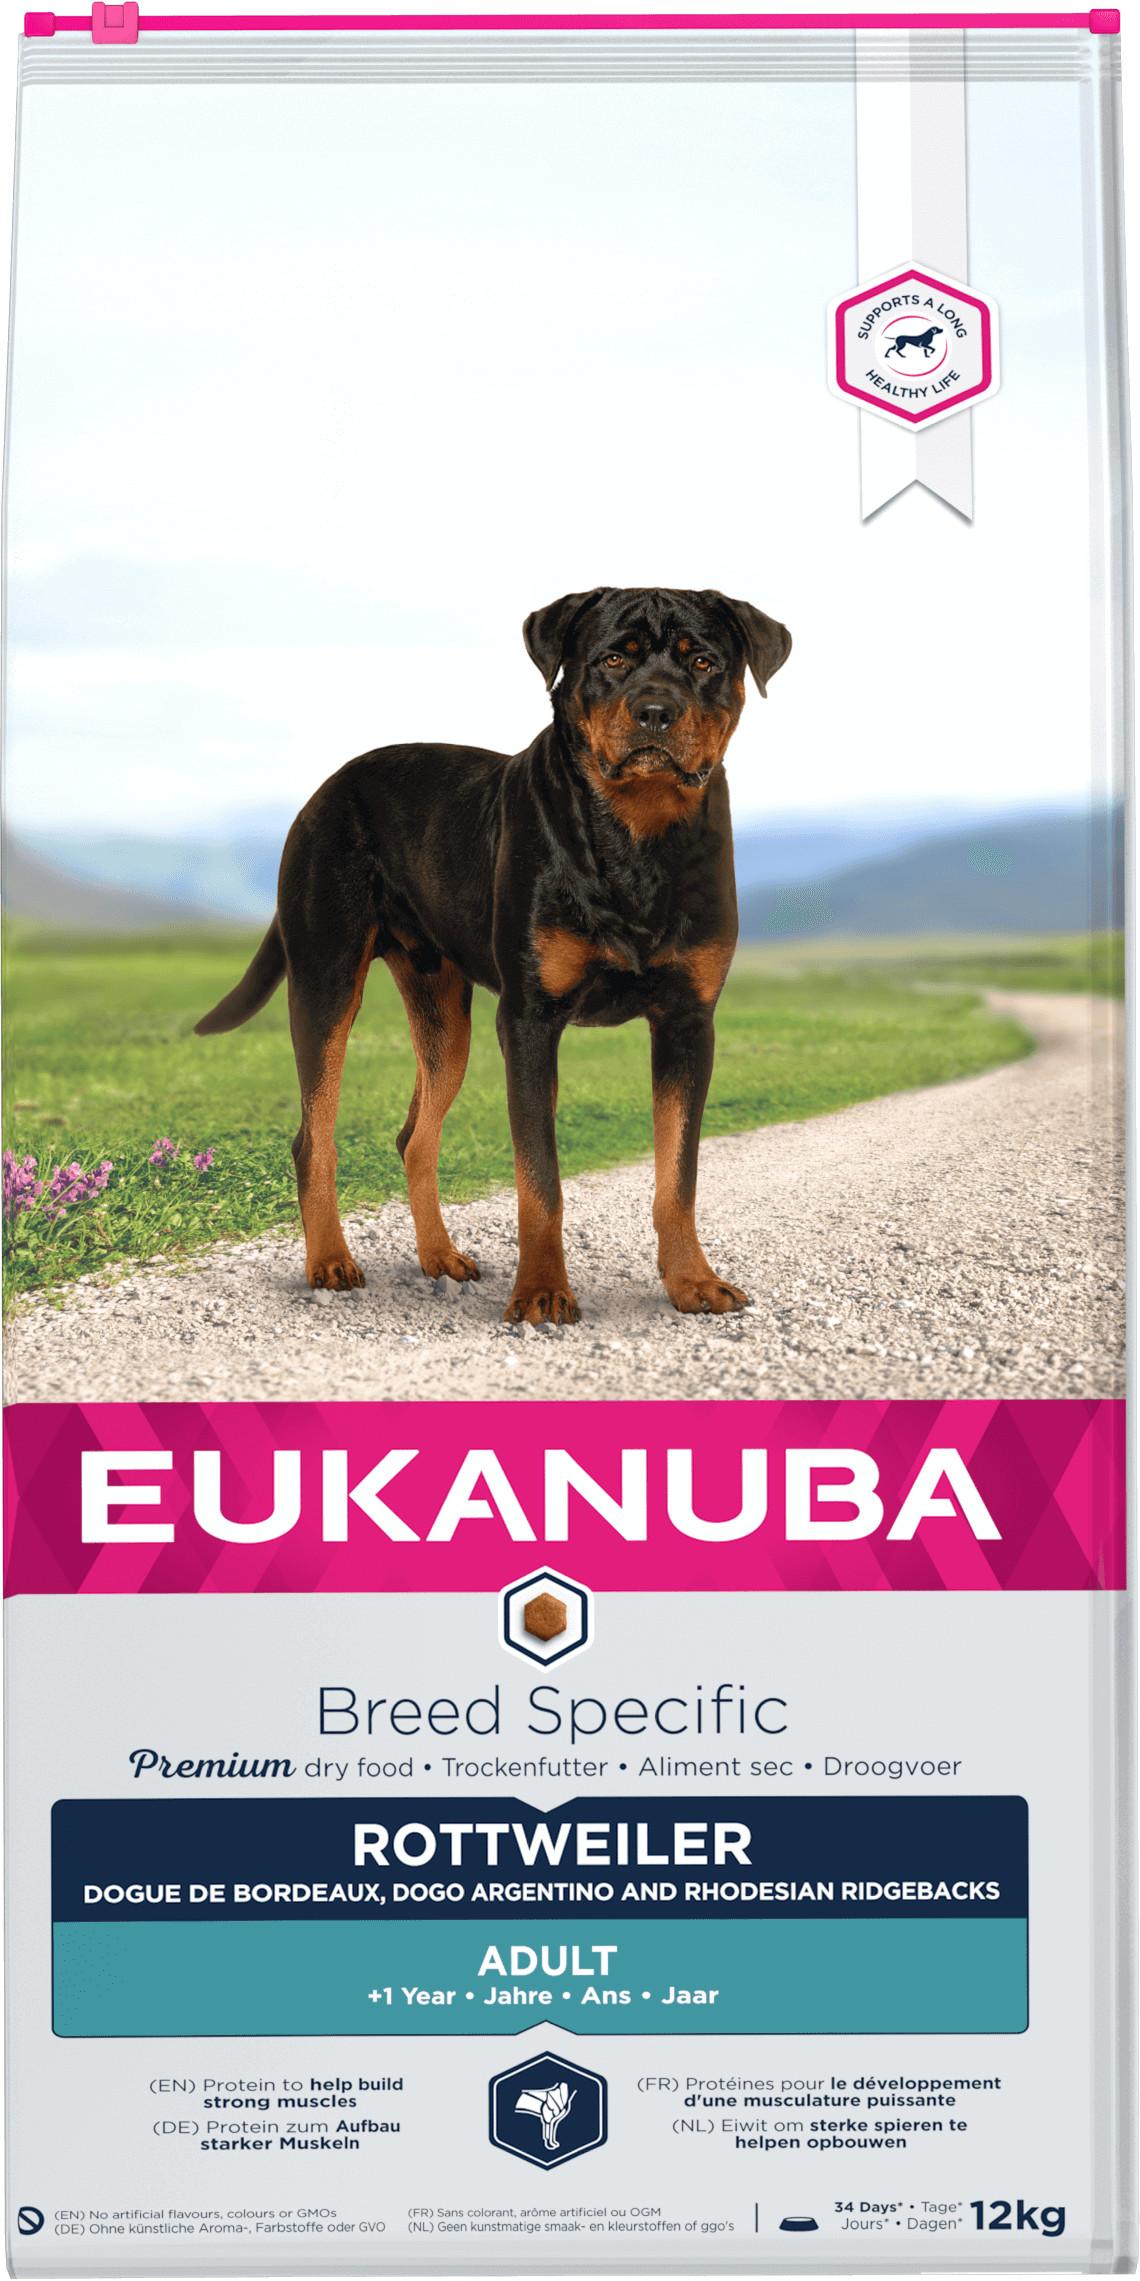 Eukanuba Rottweiler hondenvoer